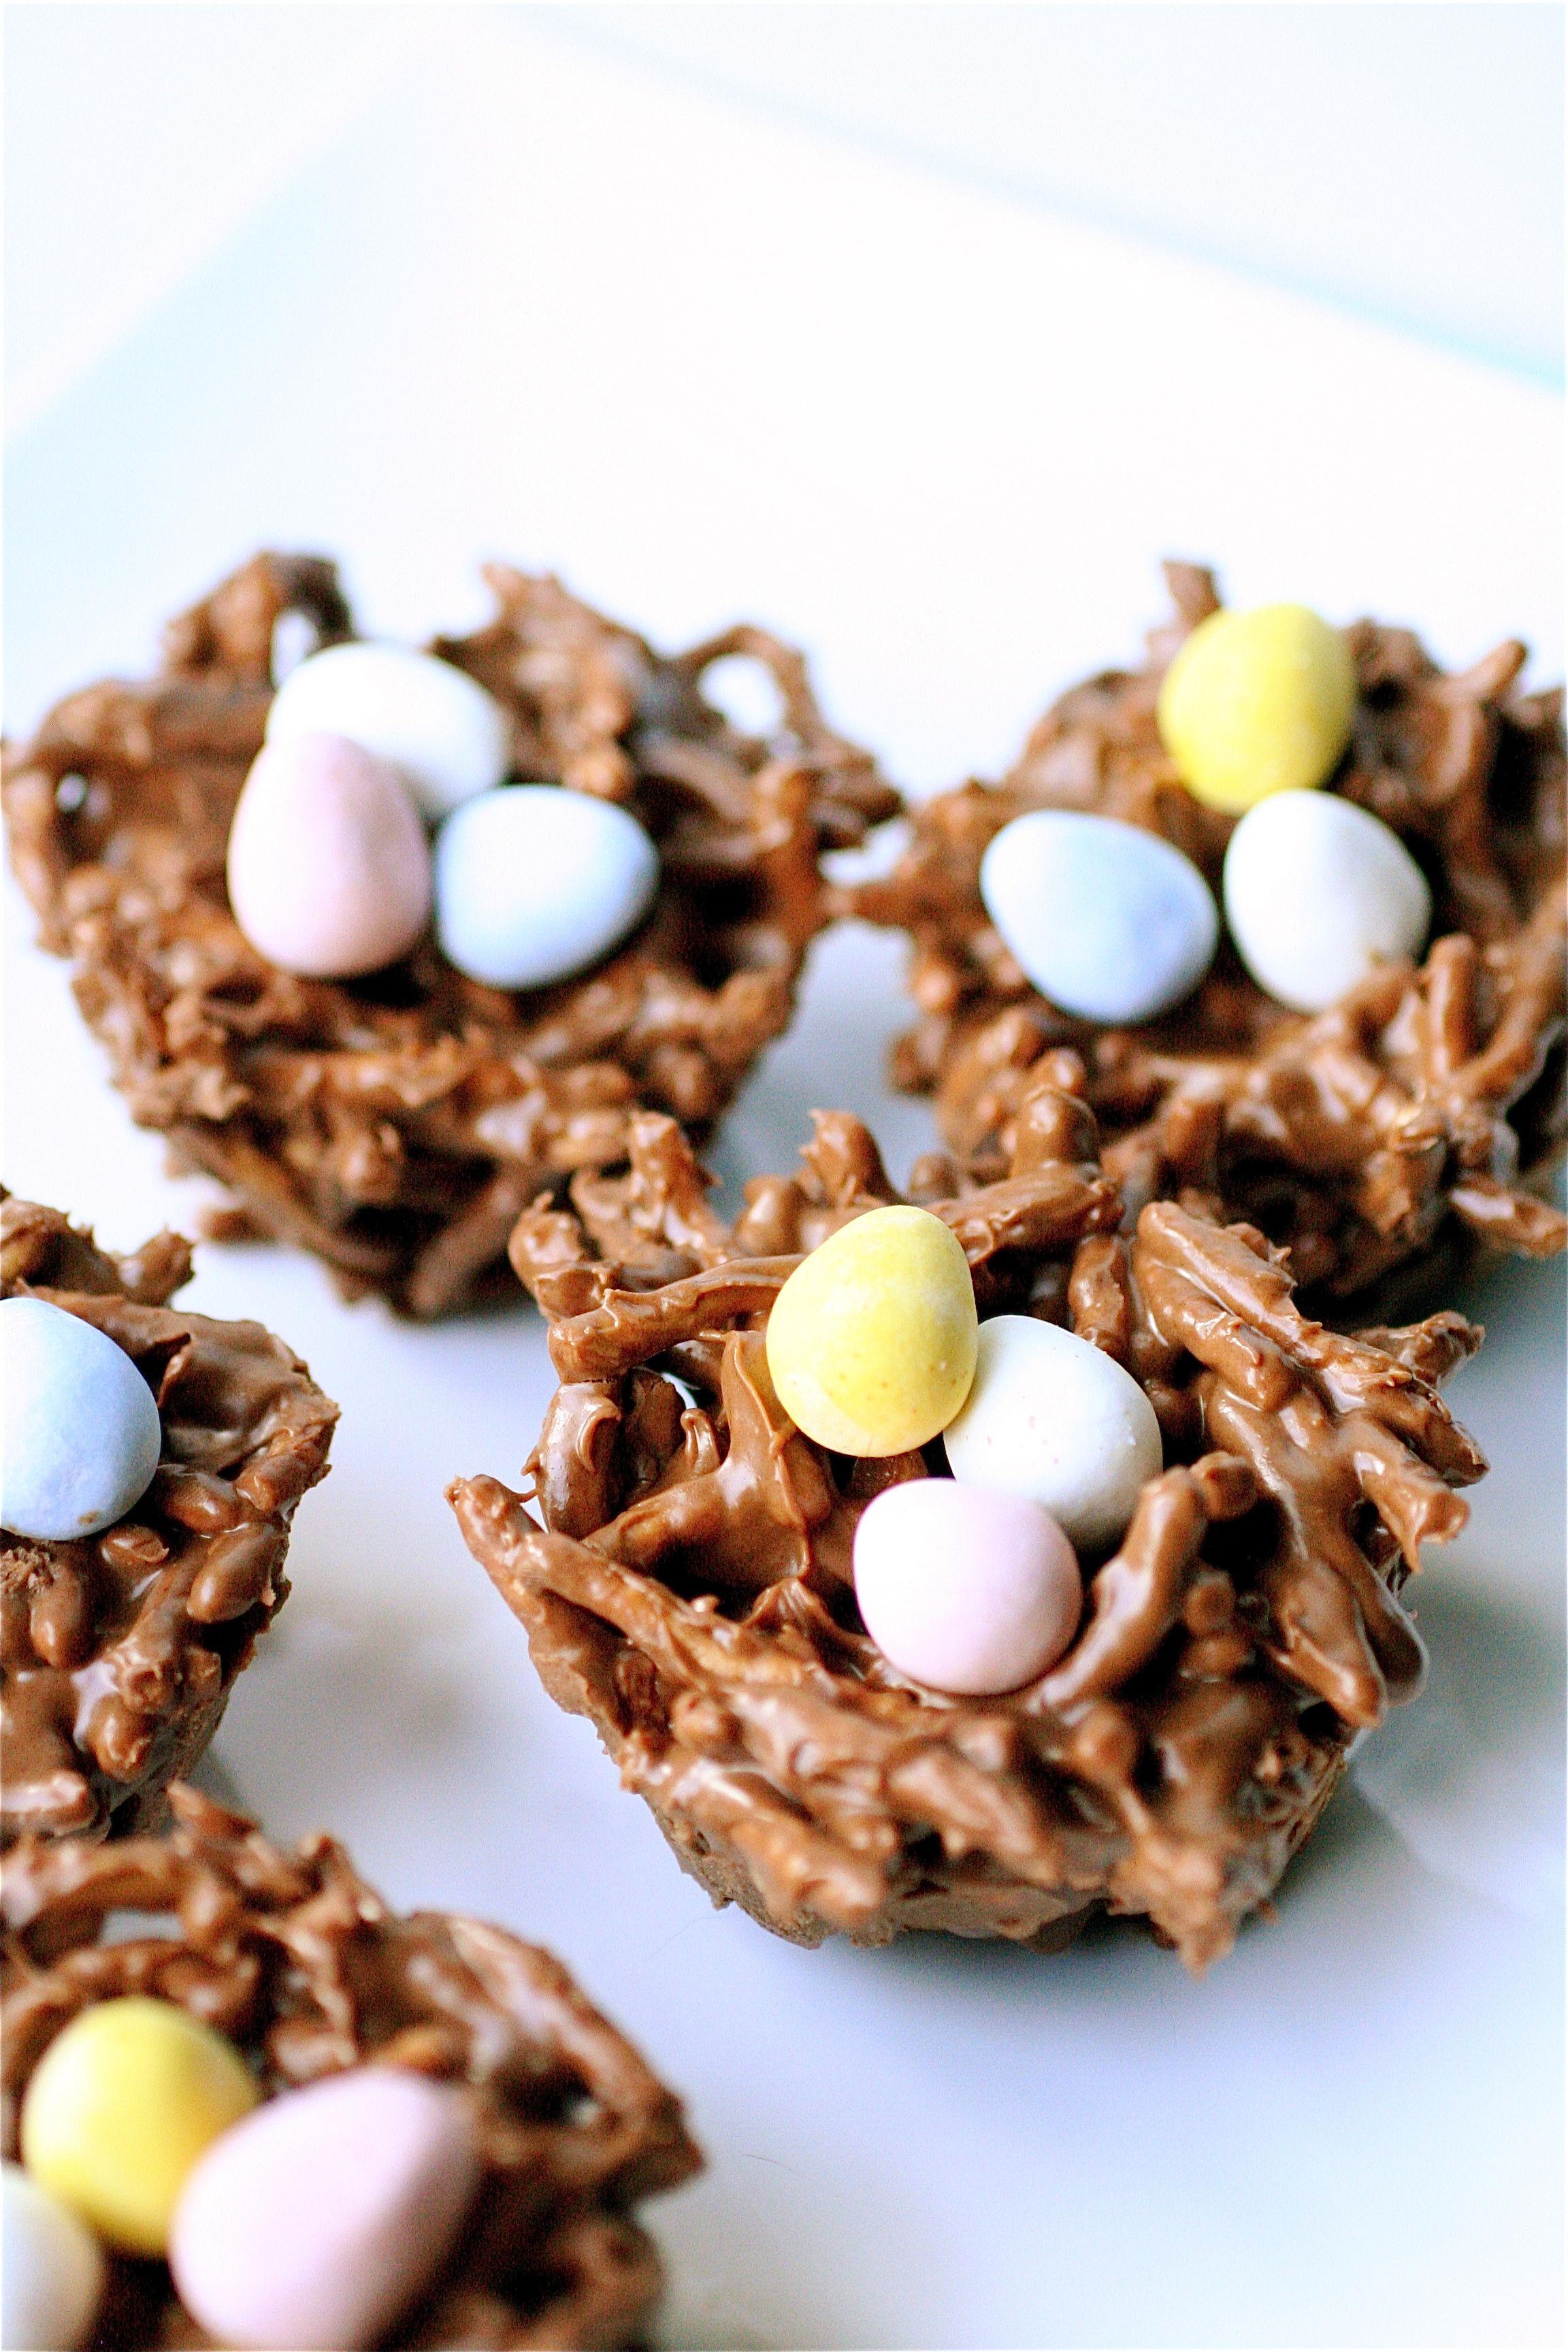 Chocolate Birds' Nests From Sarah Scoop.